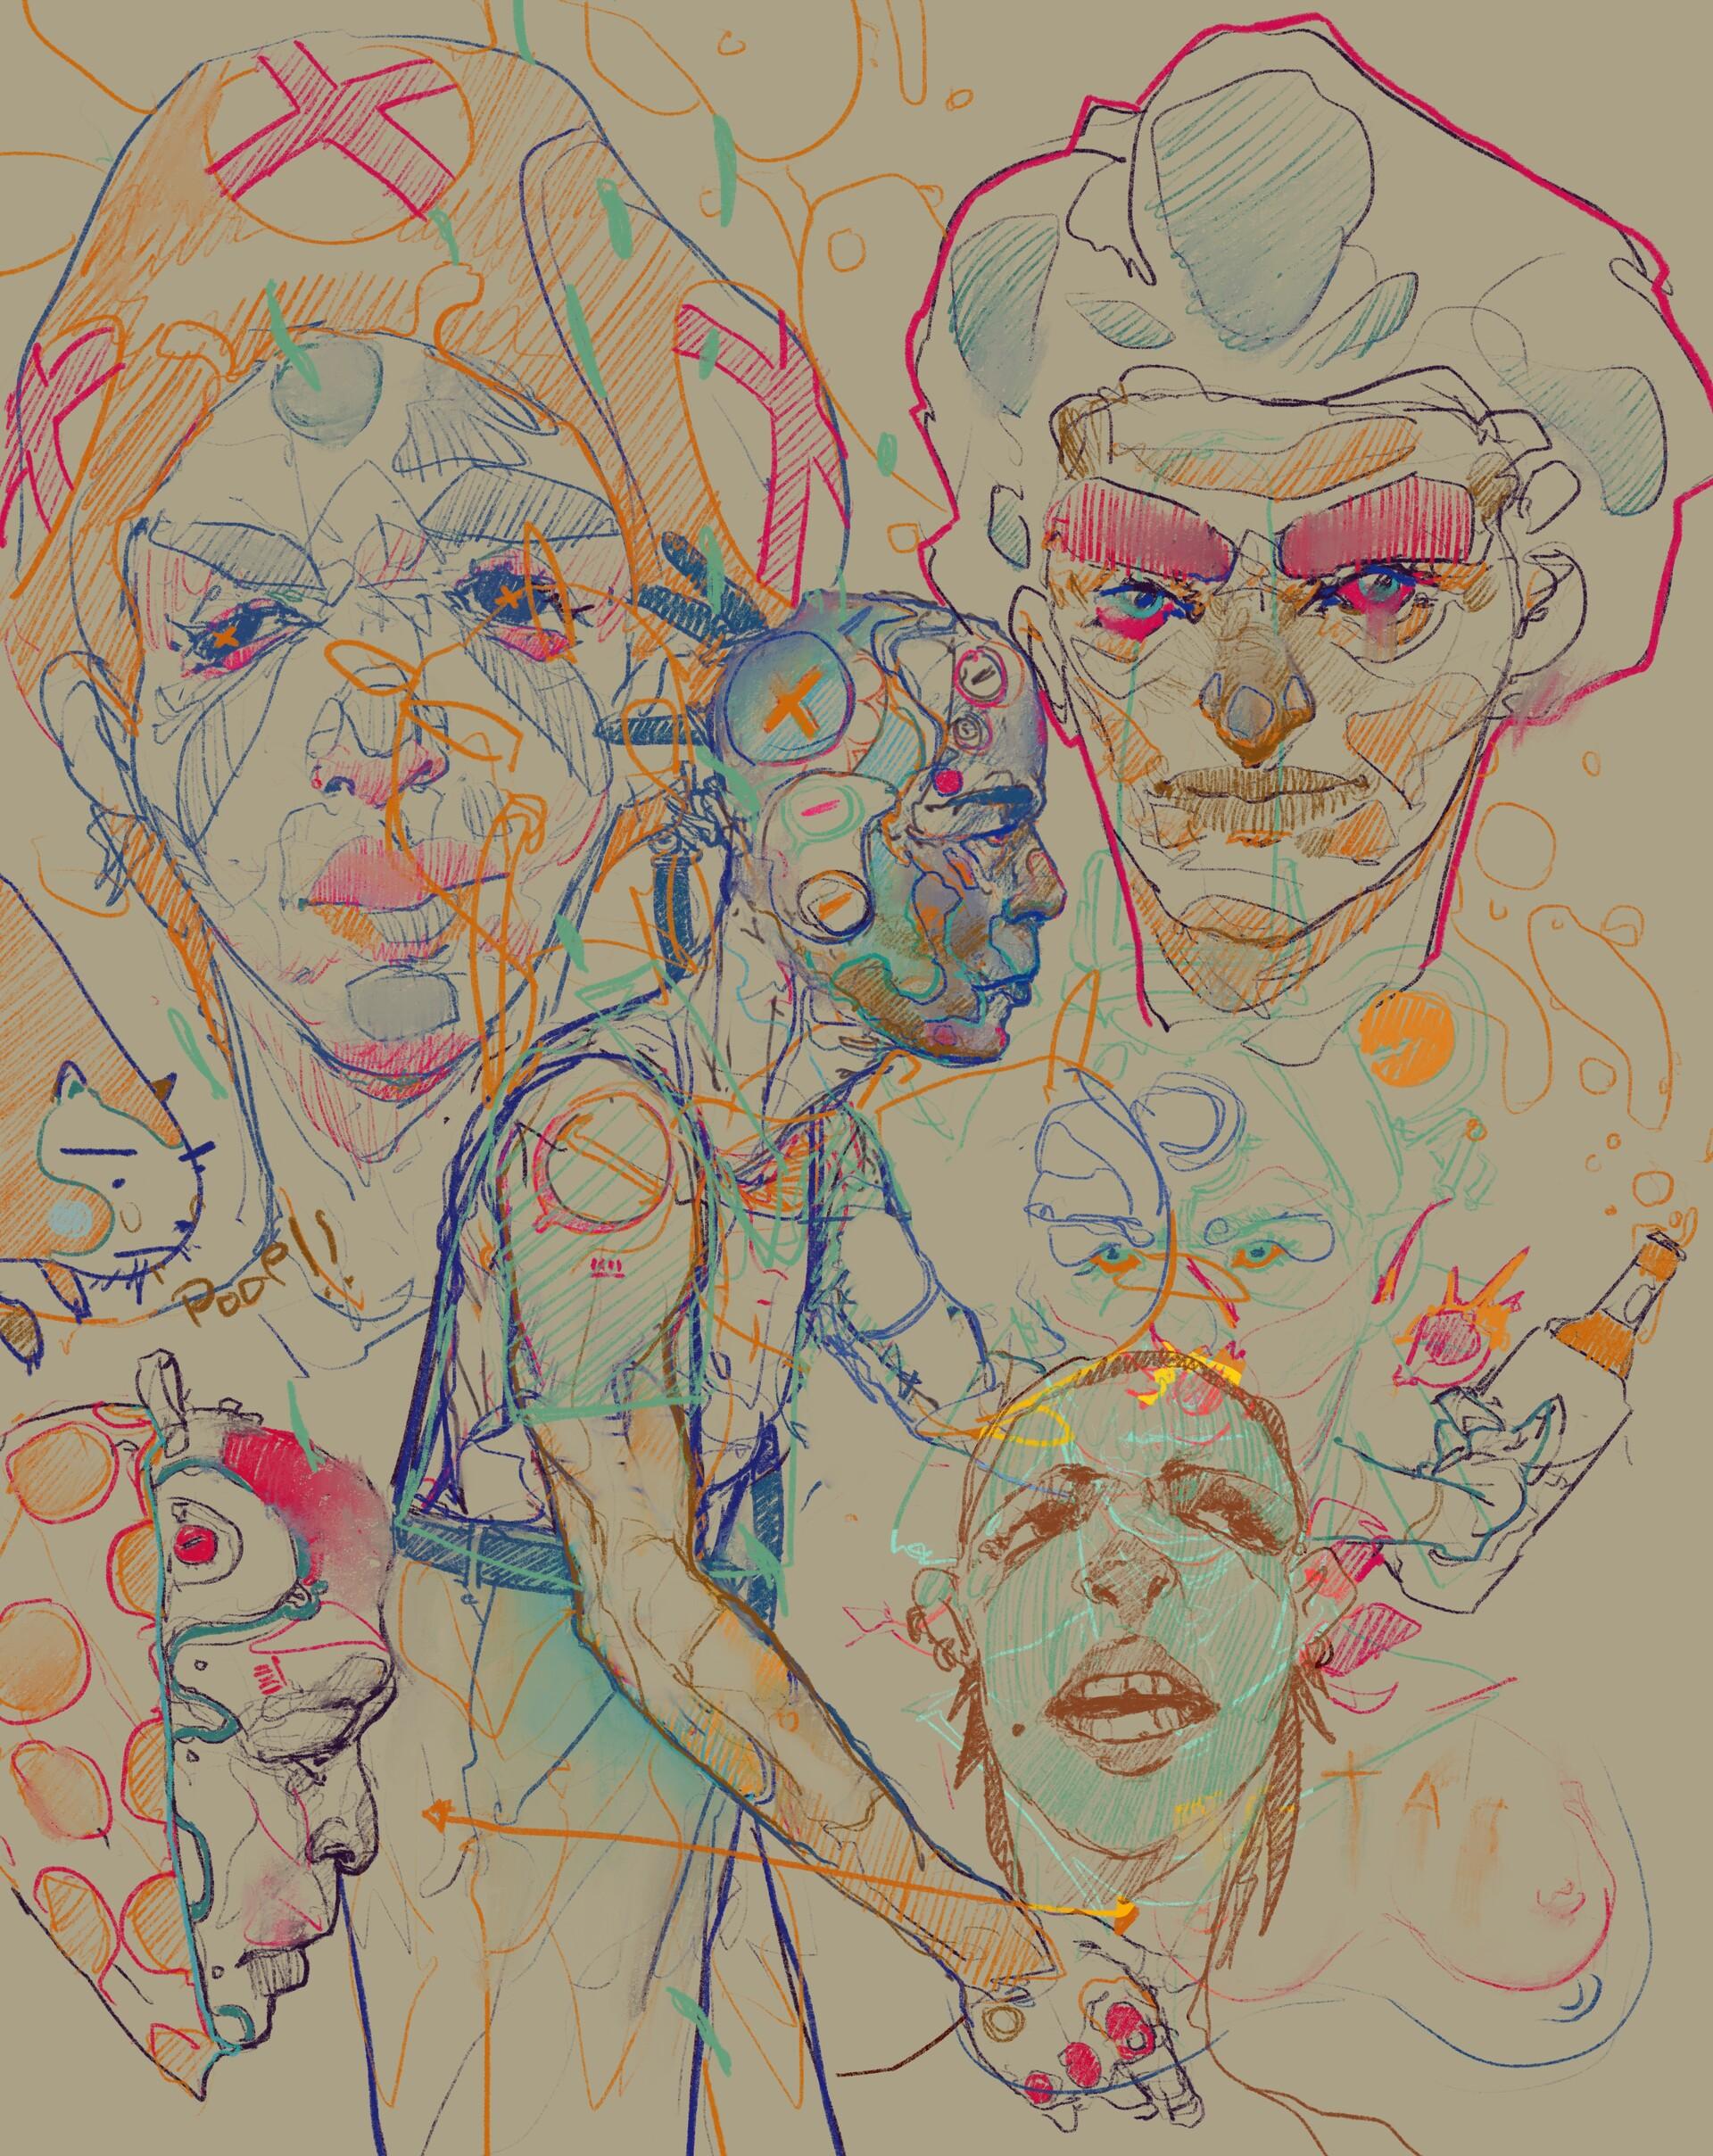 Tano bonfanti untitled artwork 3